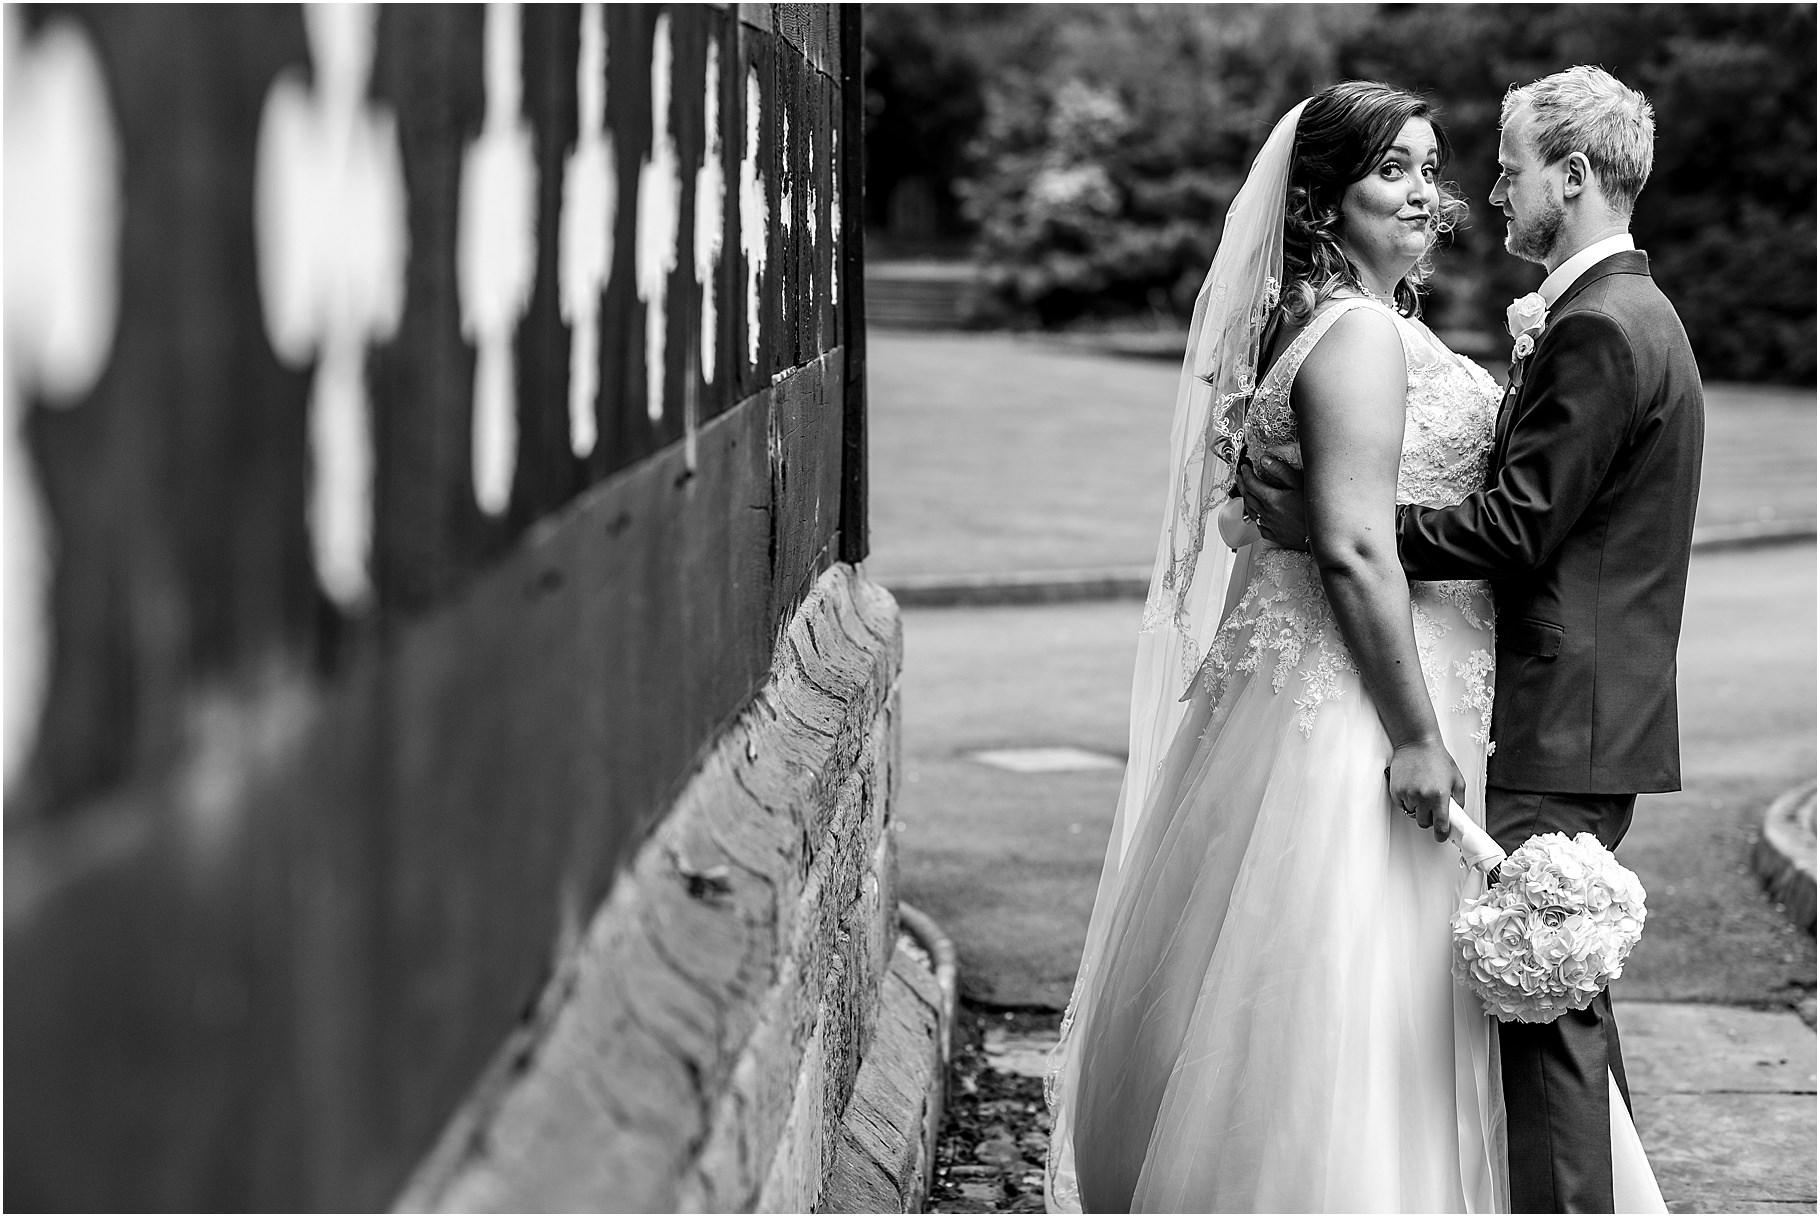 dan-wootton-photography-2017-weddings-063.jpg